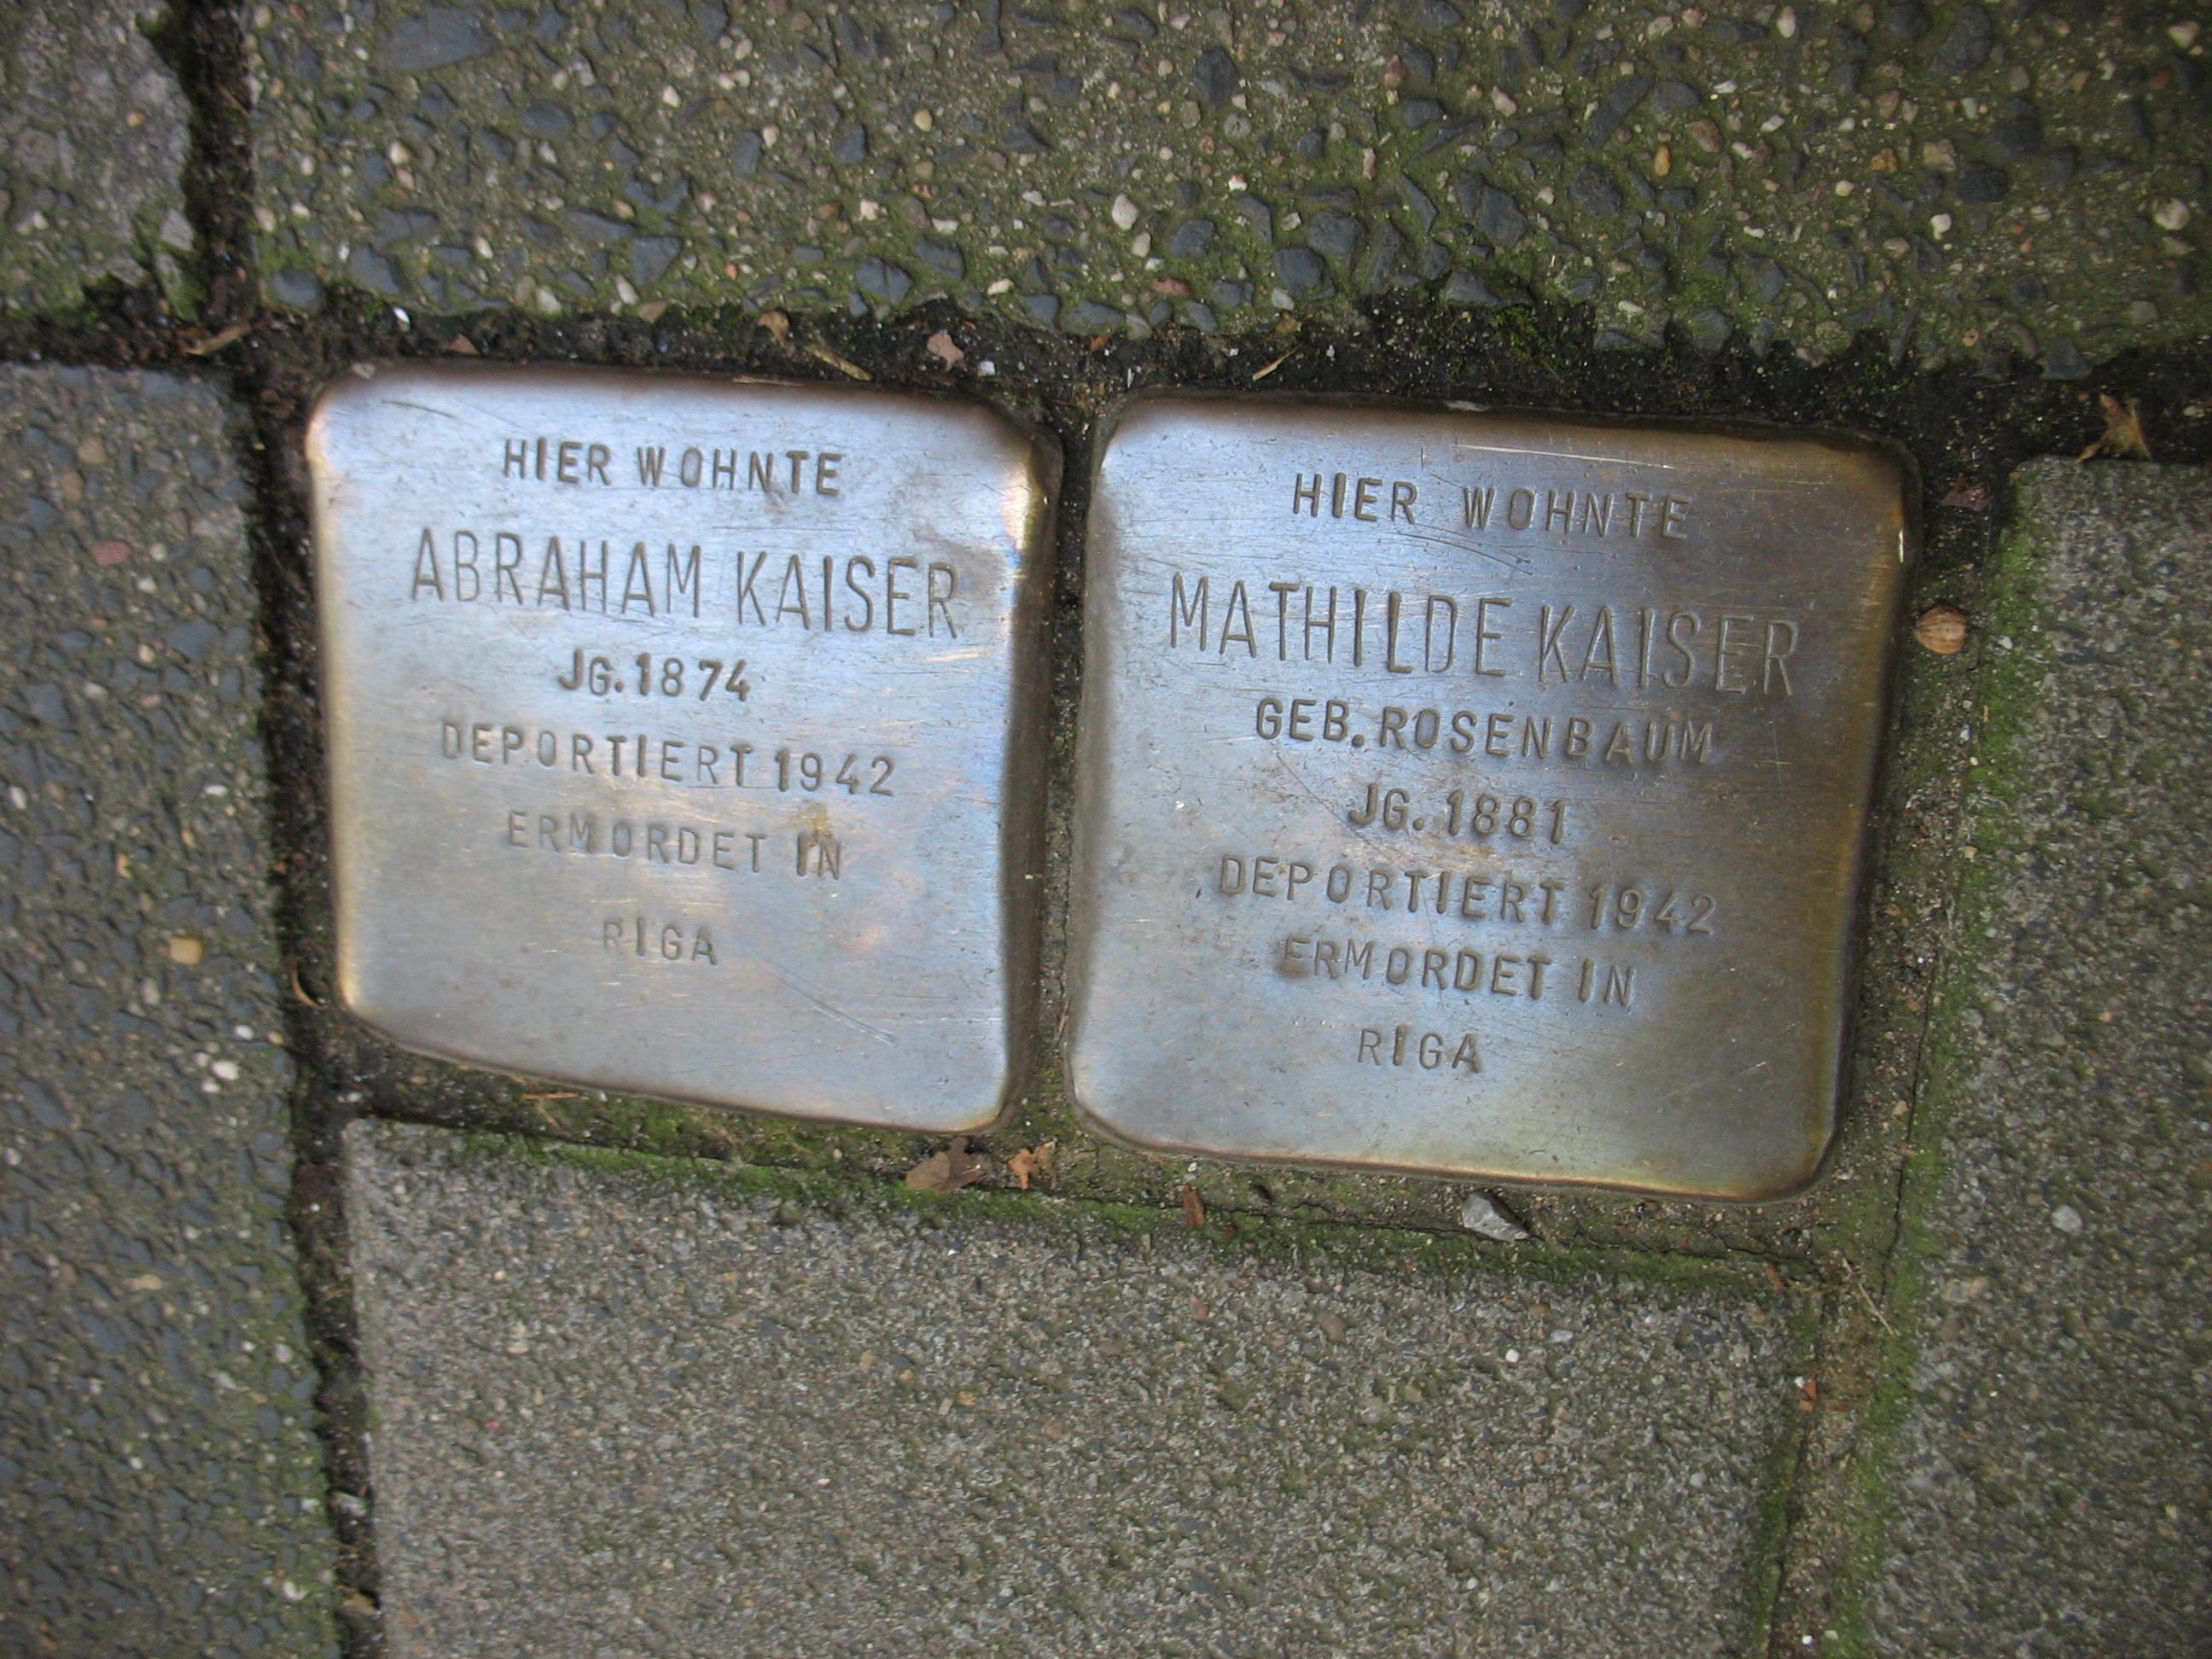 Abraham Adolf Kaiser